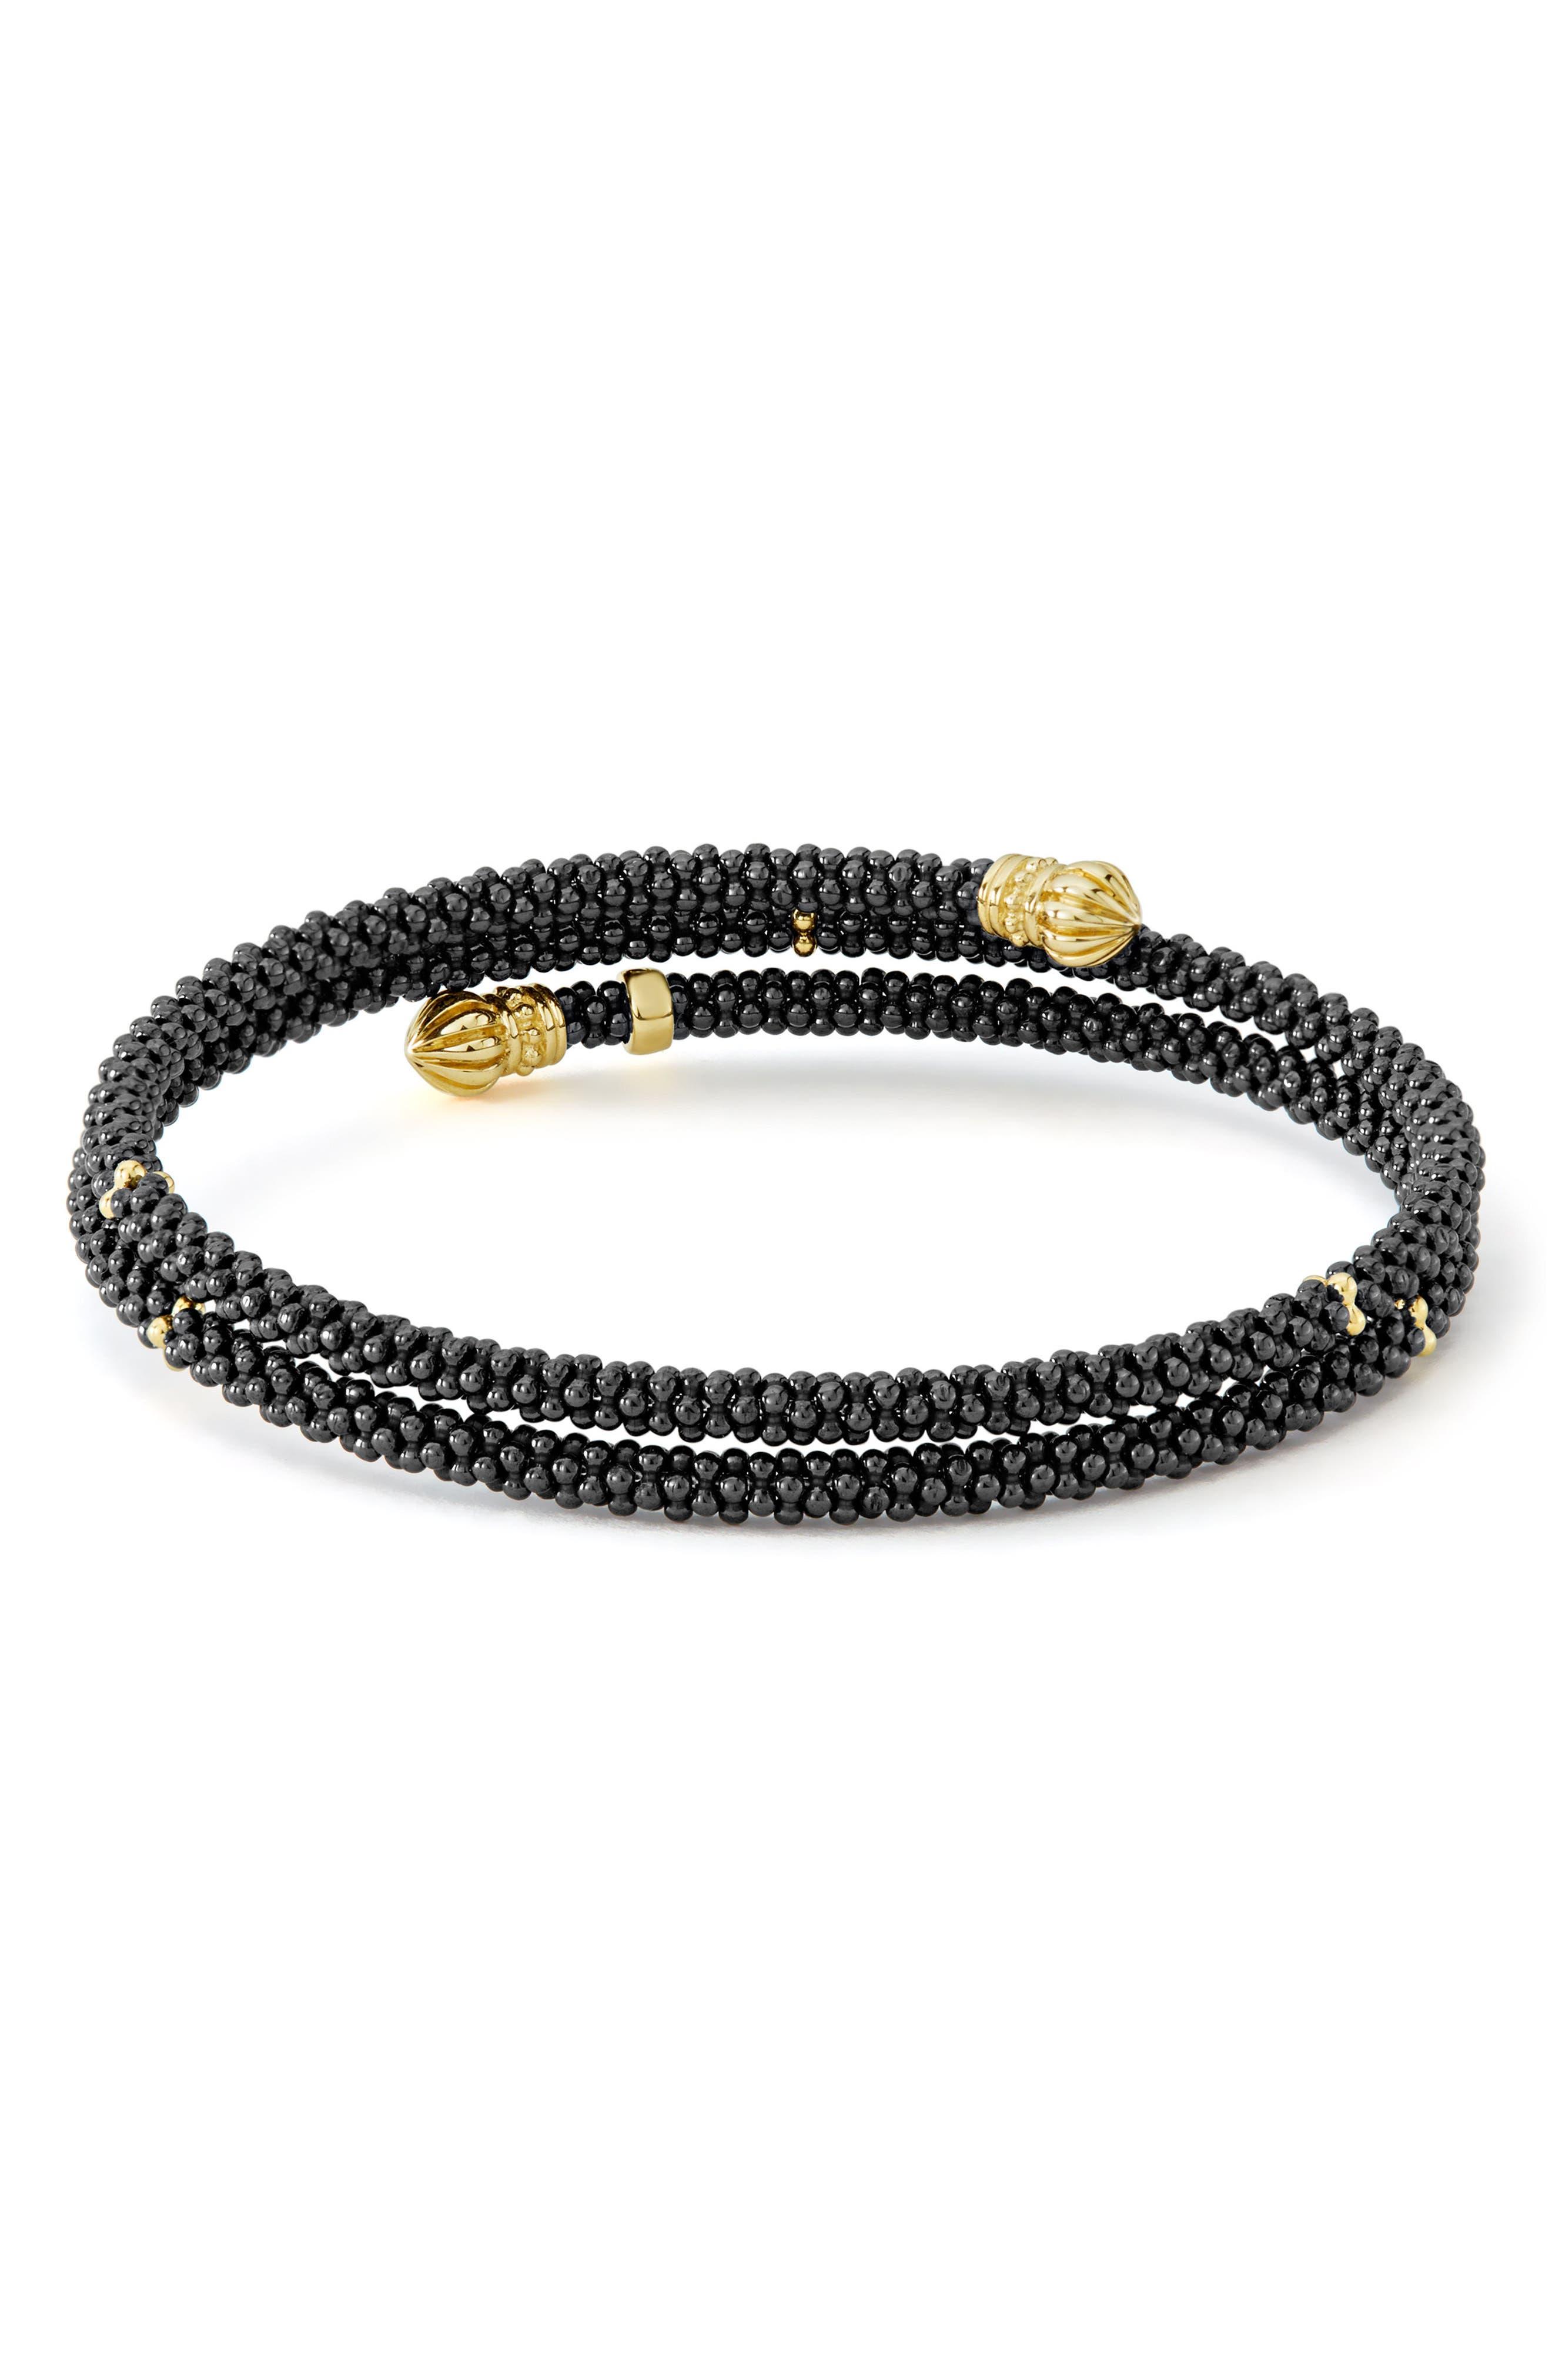 Gold & Black Caviar Coil Bracelet,                             Alternate thumbnail 3, color,                             GOLD